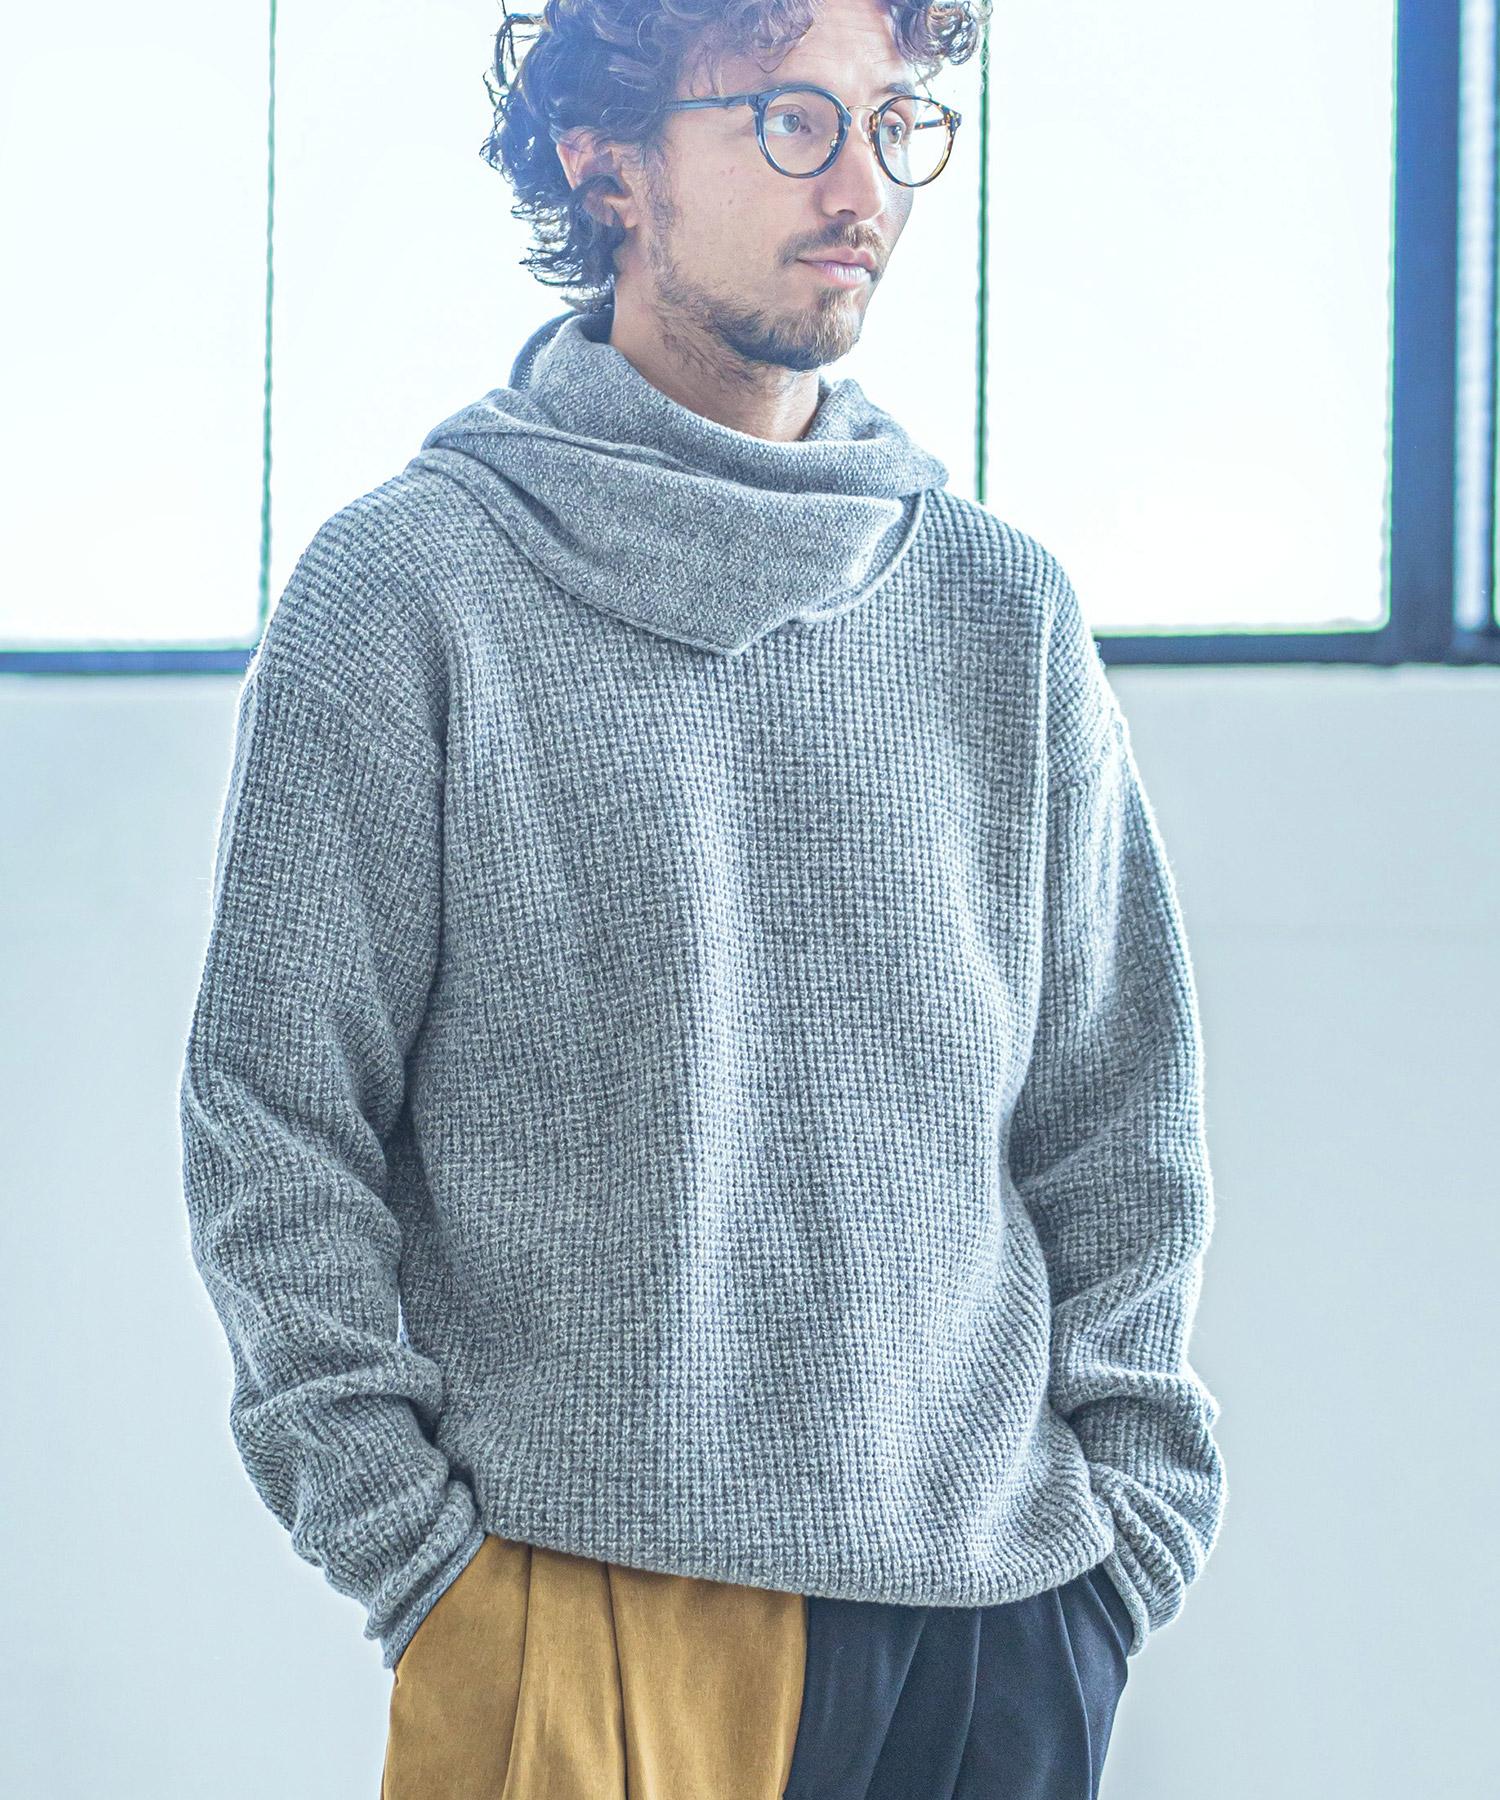 【ANGENEHM(アンゲネーム)】【予約販売10月中旬~下旬入荷】Stole Neck Knit Pullover (MADE IN JAPAN) プルオーバー